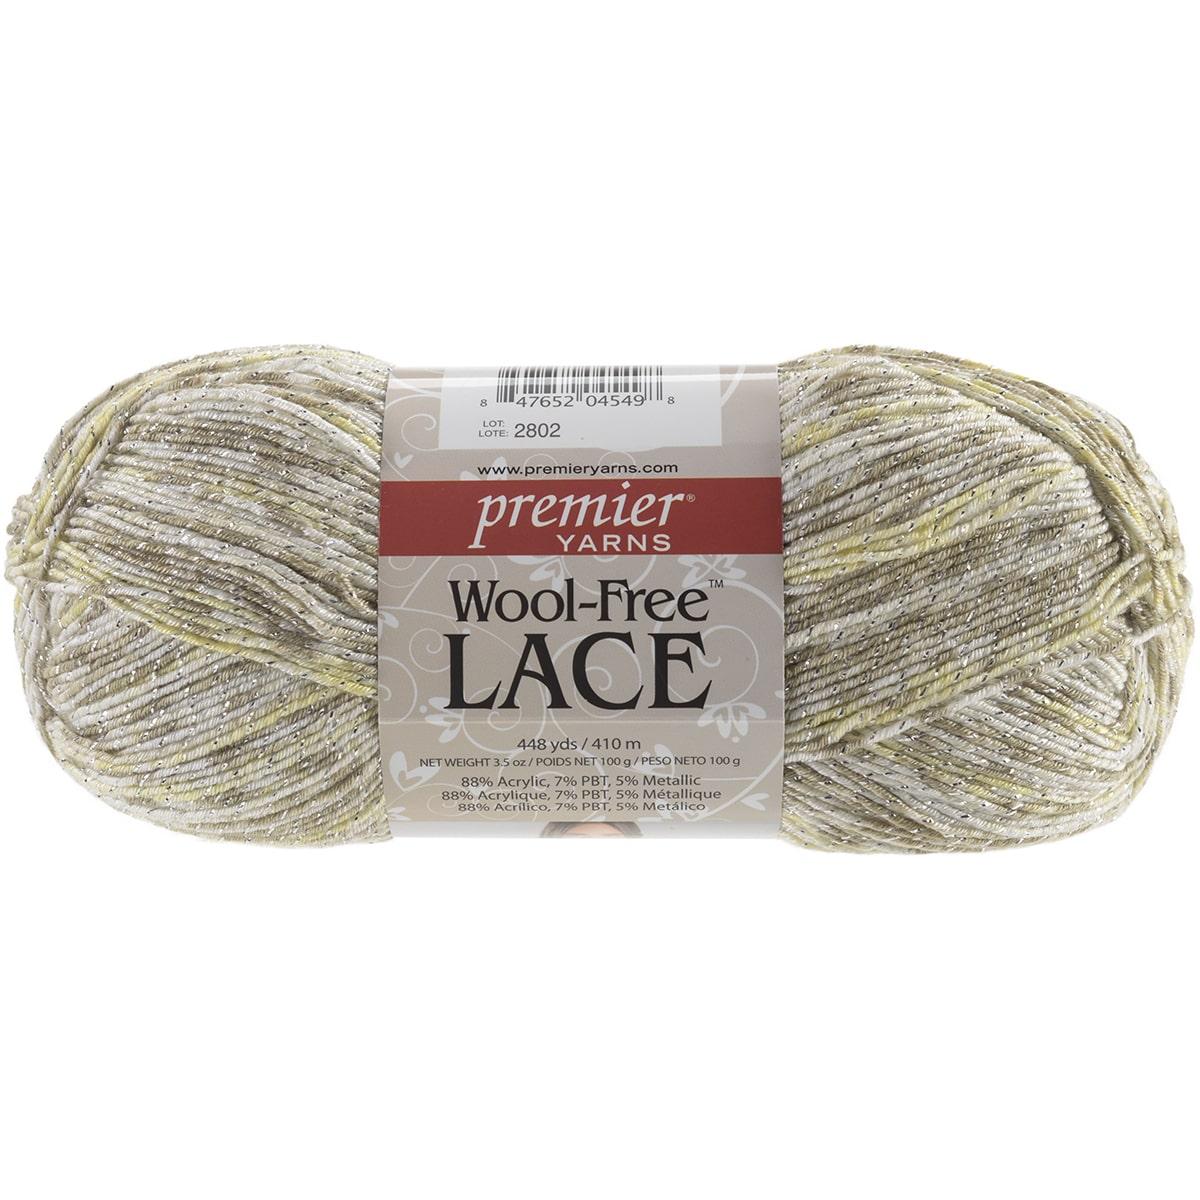 Wool-Free Lace Yarn-White Gold - image 2 of 2